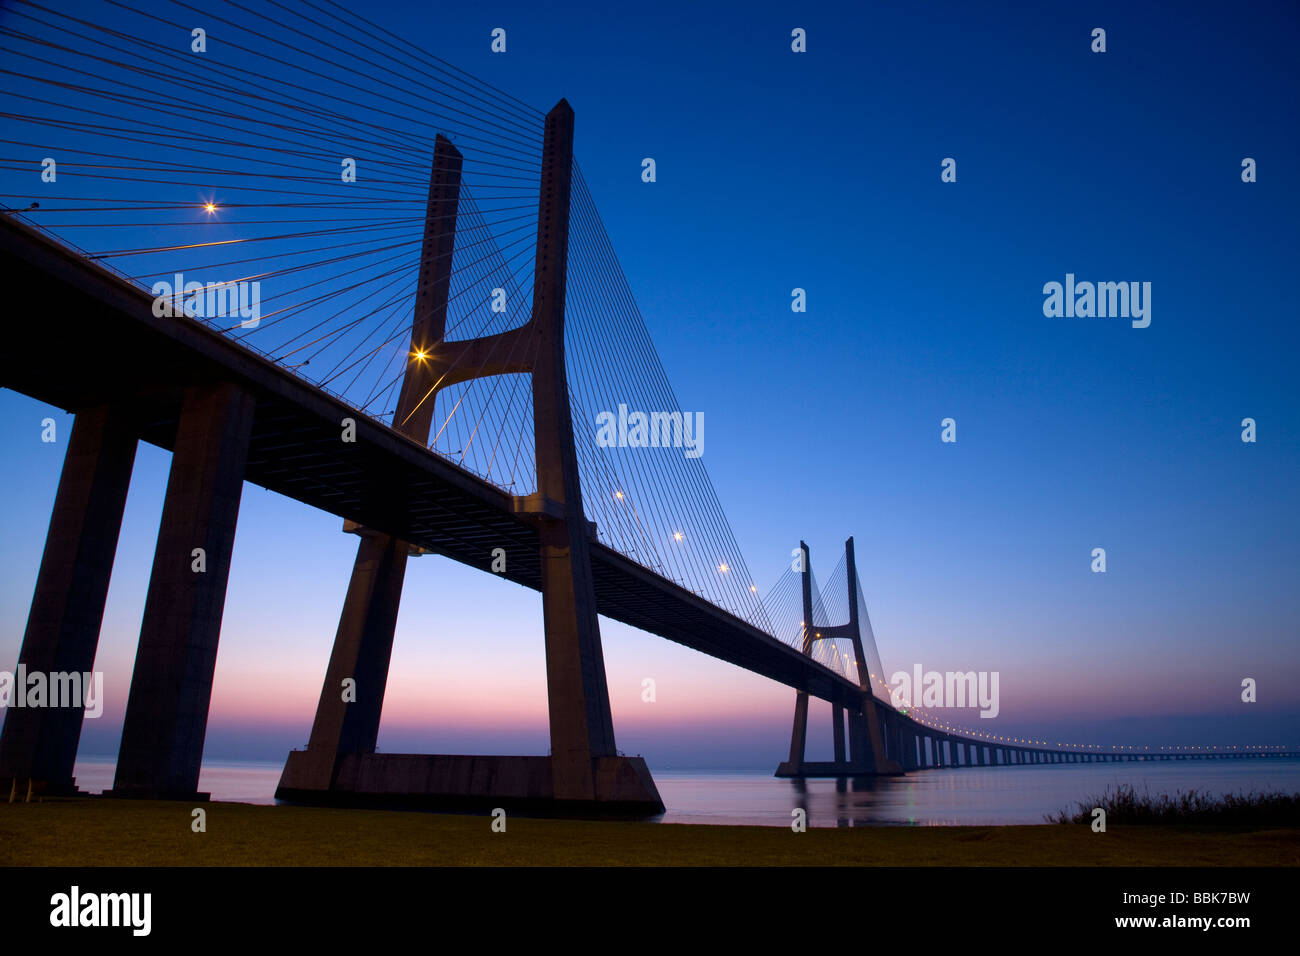 Vasco de Gama suspension bridge at night, Lisbon, Portugal, Europe - Stock Image